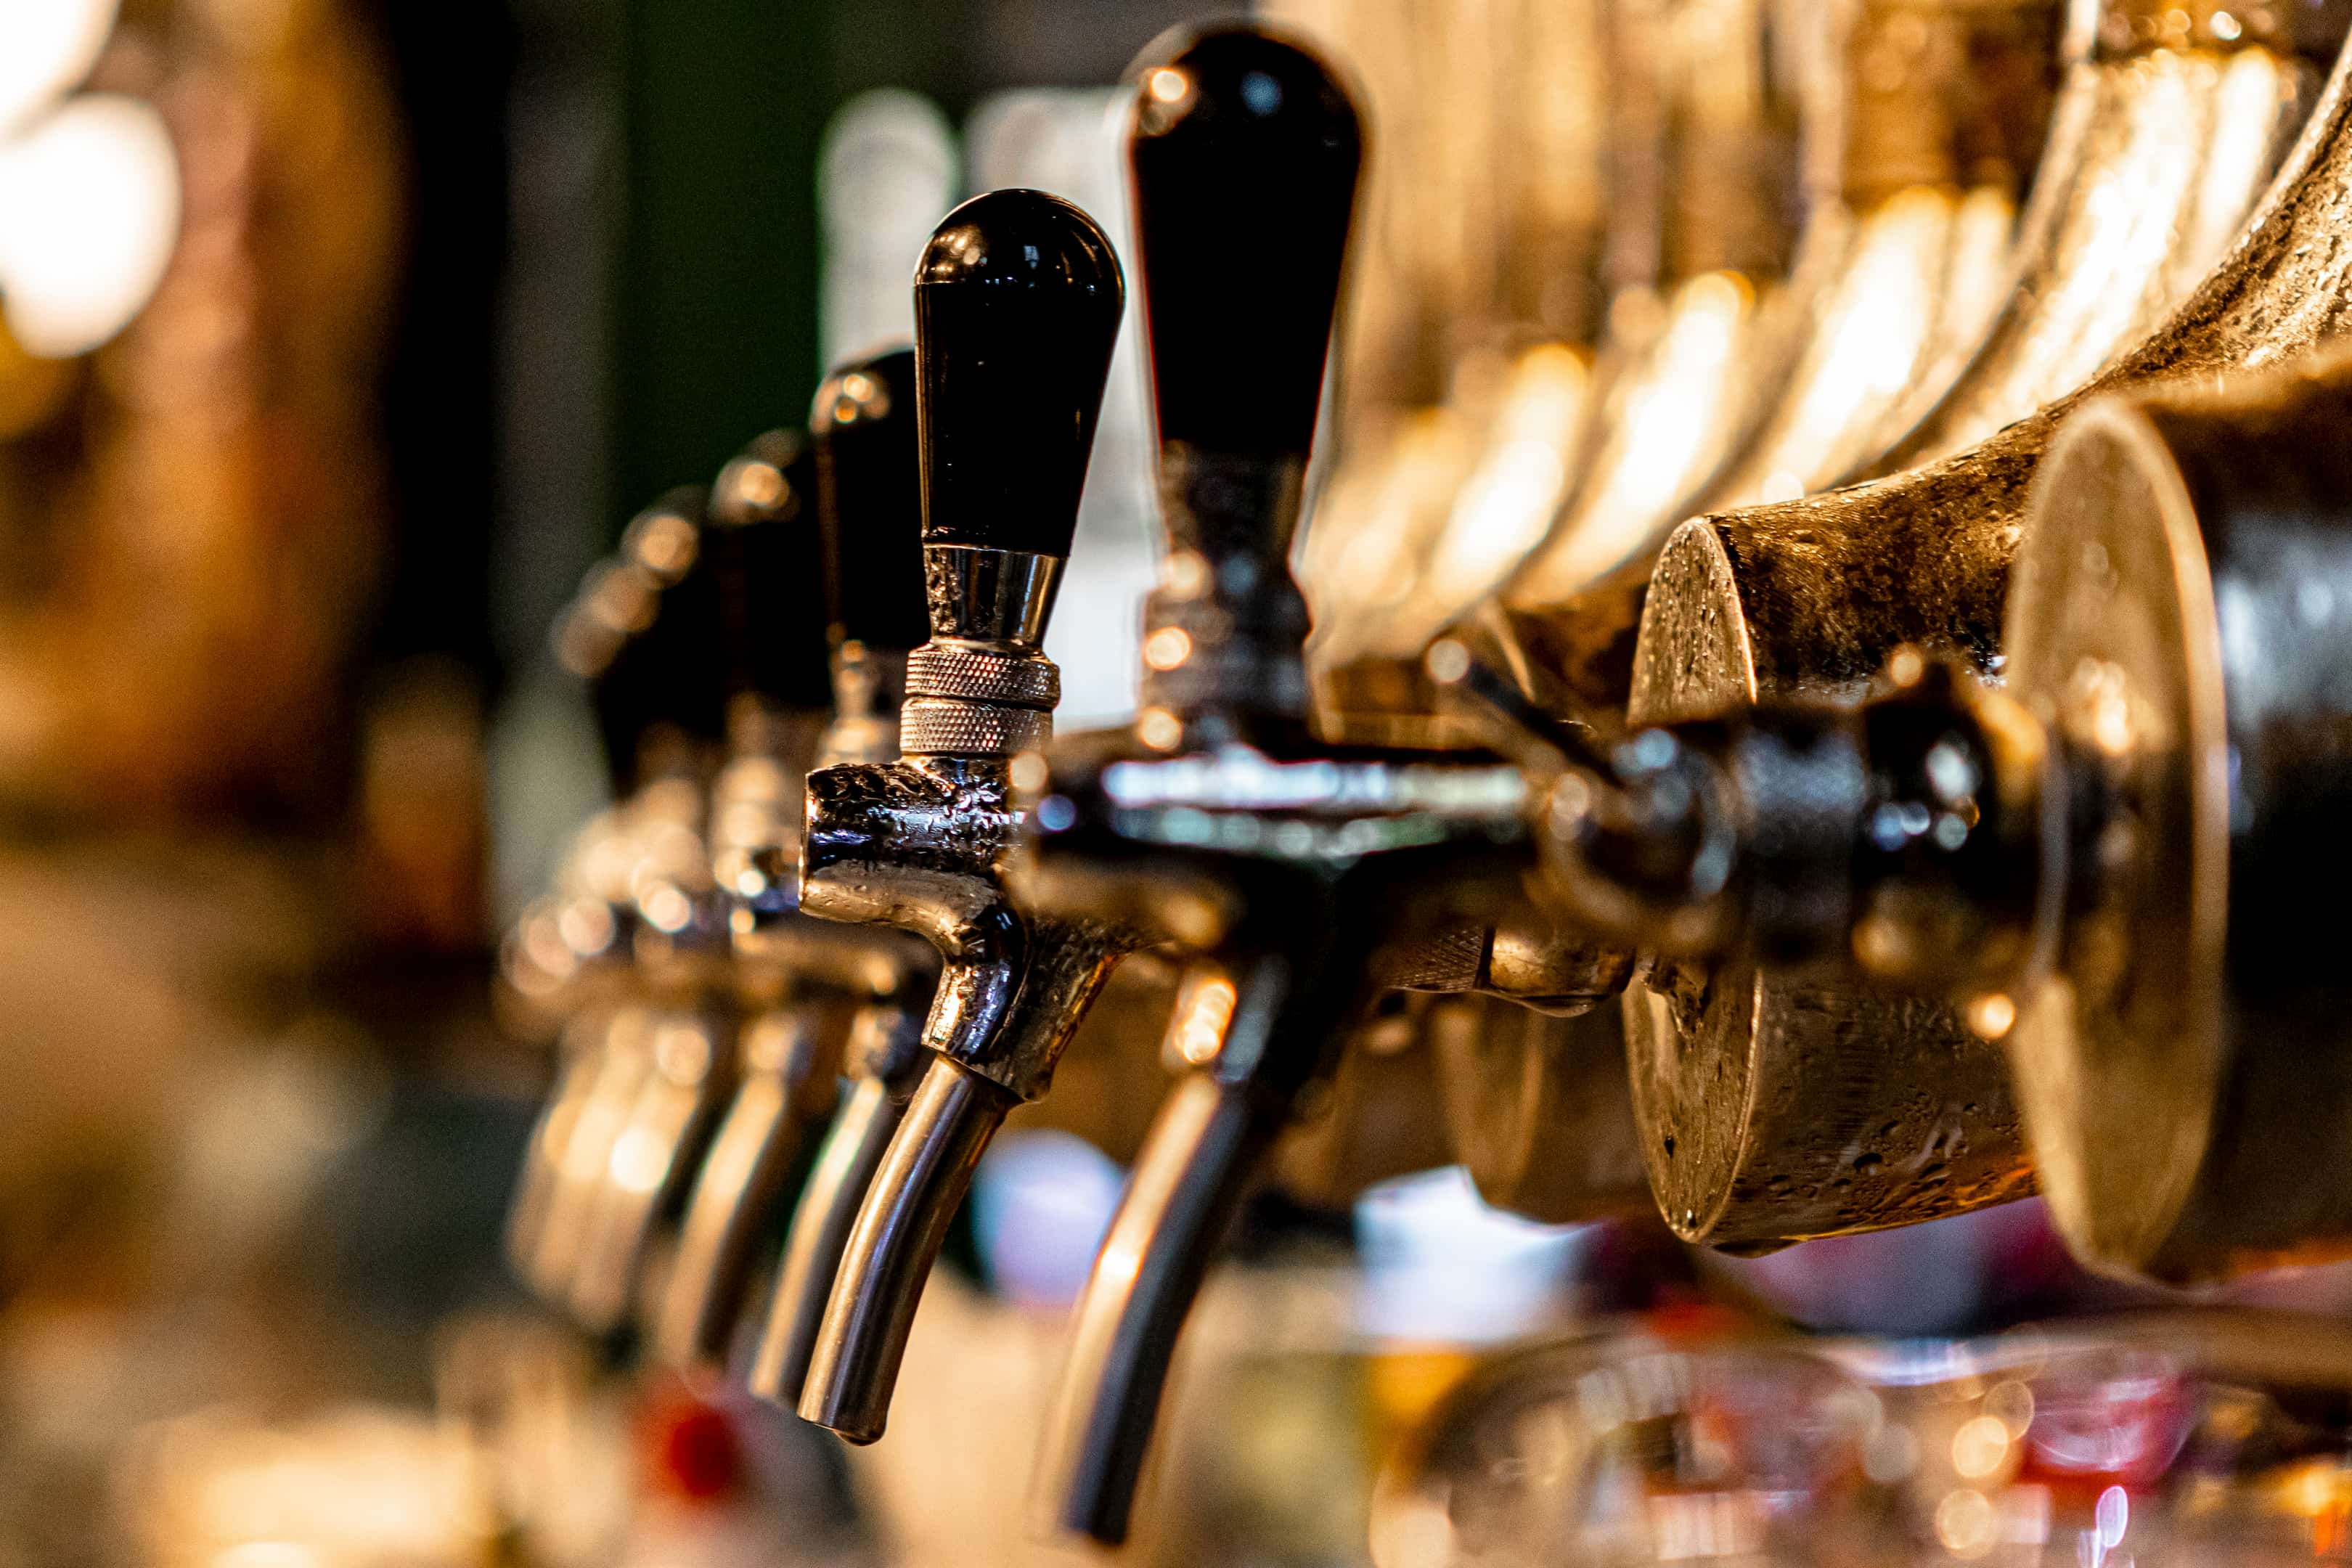 Glistening beer taps